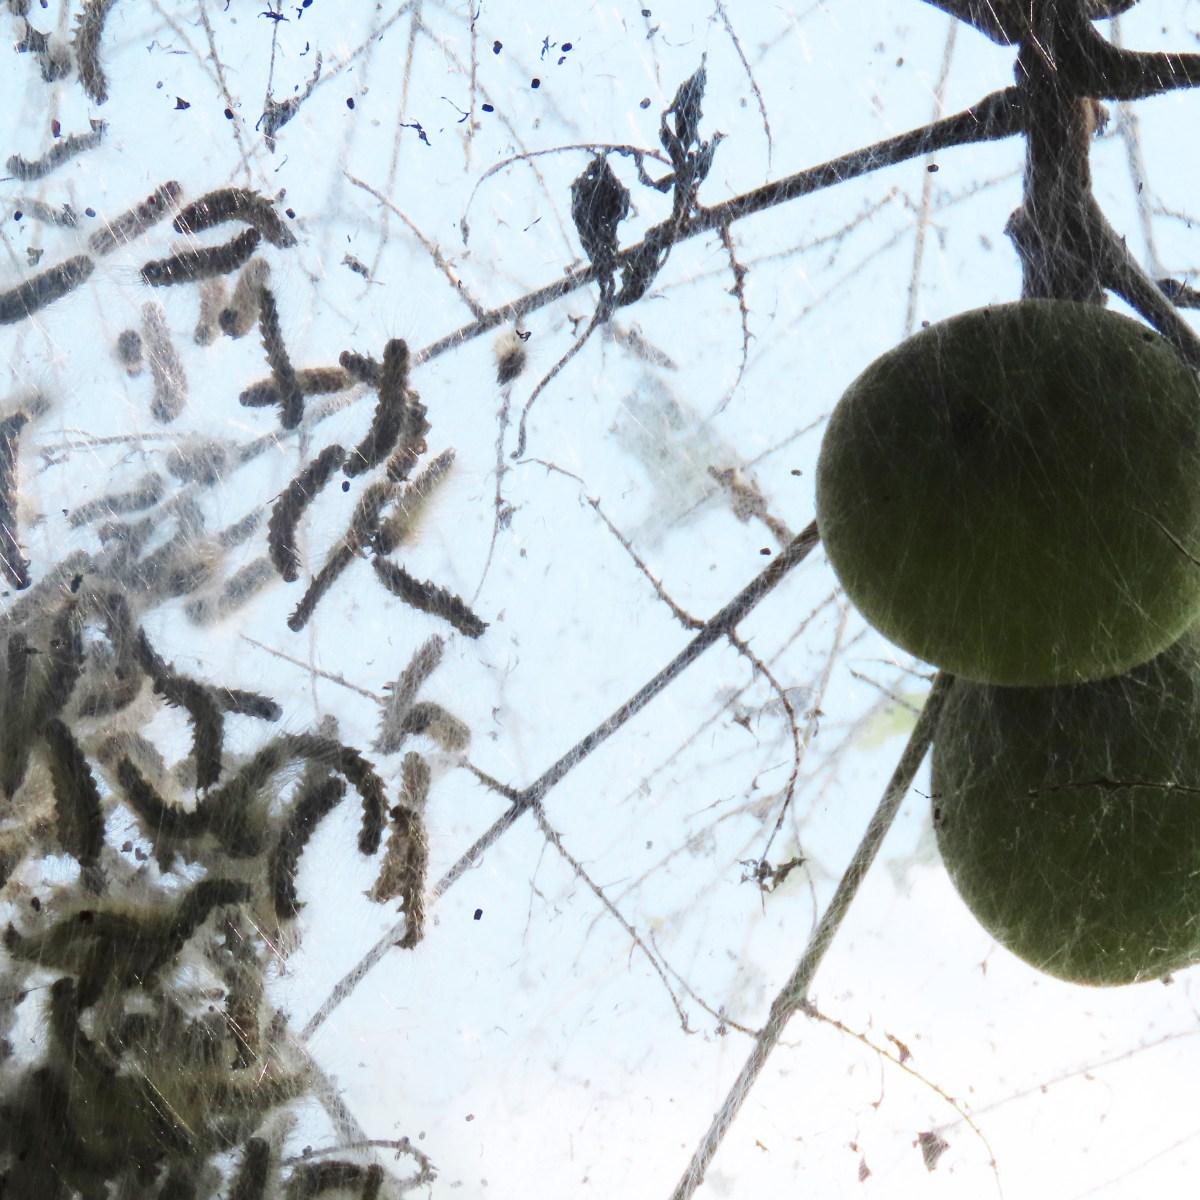 Fall webworms seen through their tent in a black walnut tree